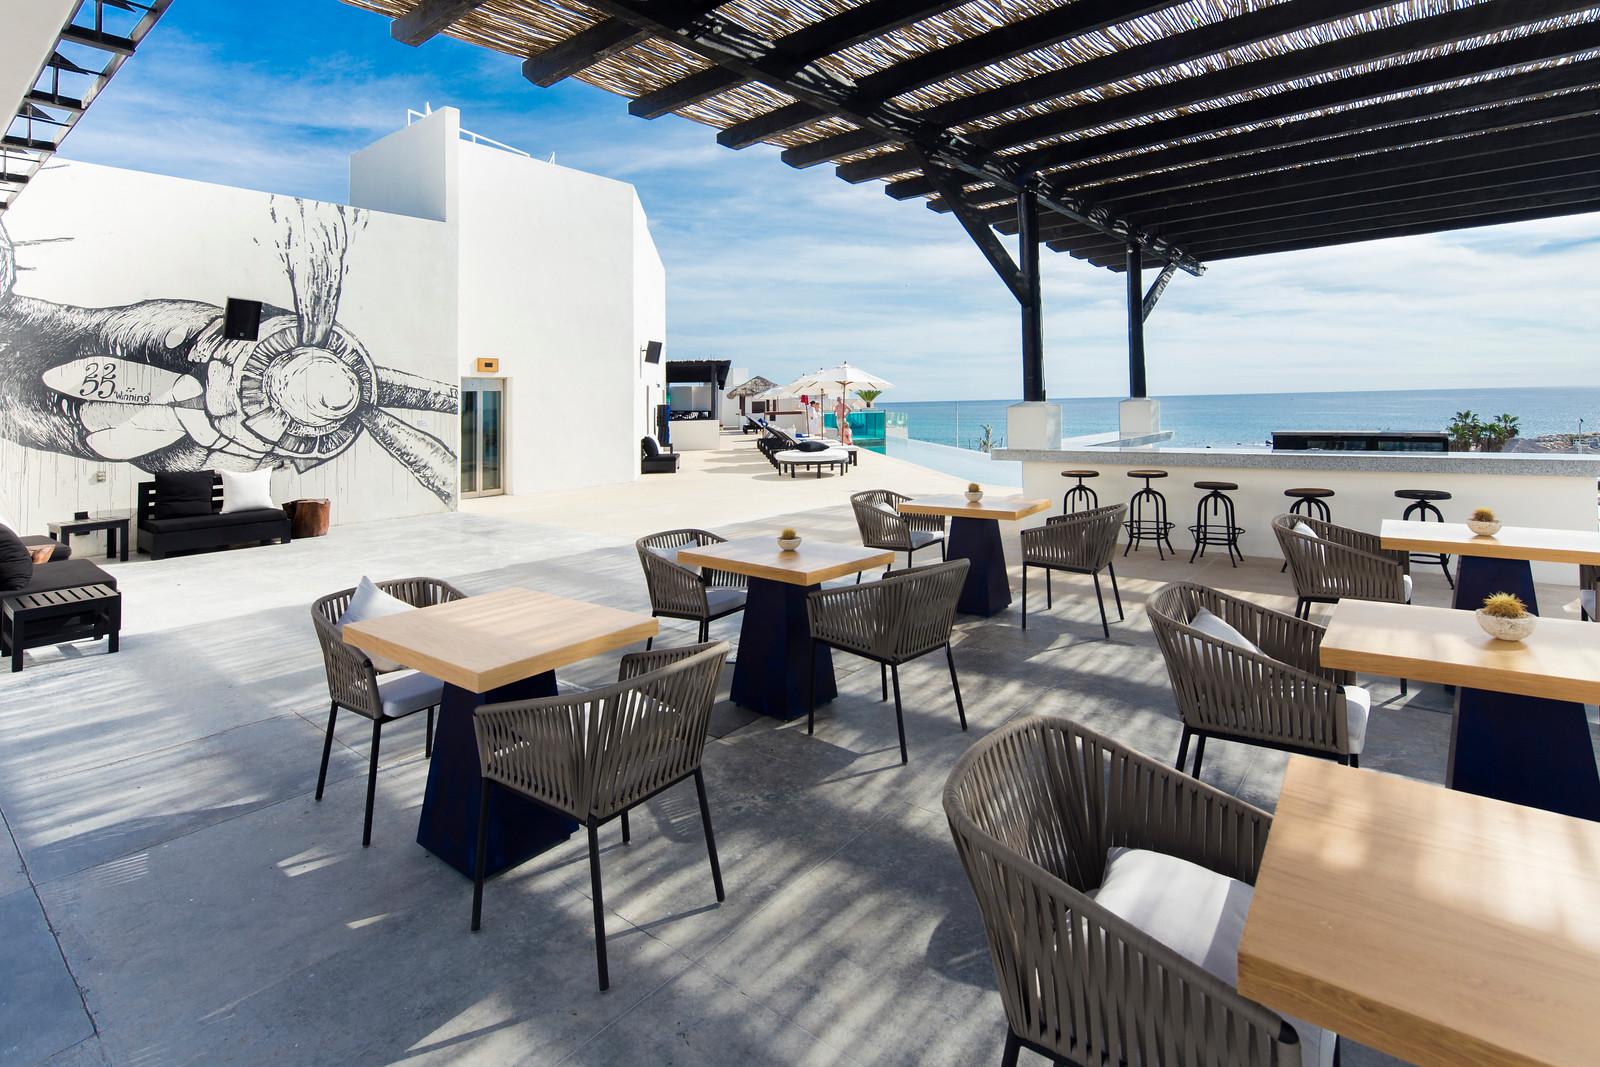 The Rooftop Sushi &Bar at Hotel El Ganzo. Photo Courtesy of Hotel El Ganzo